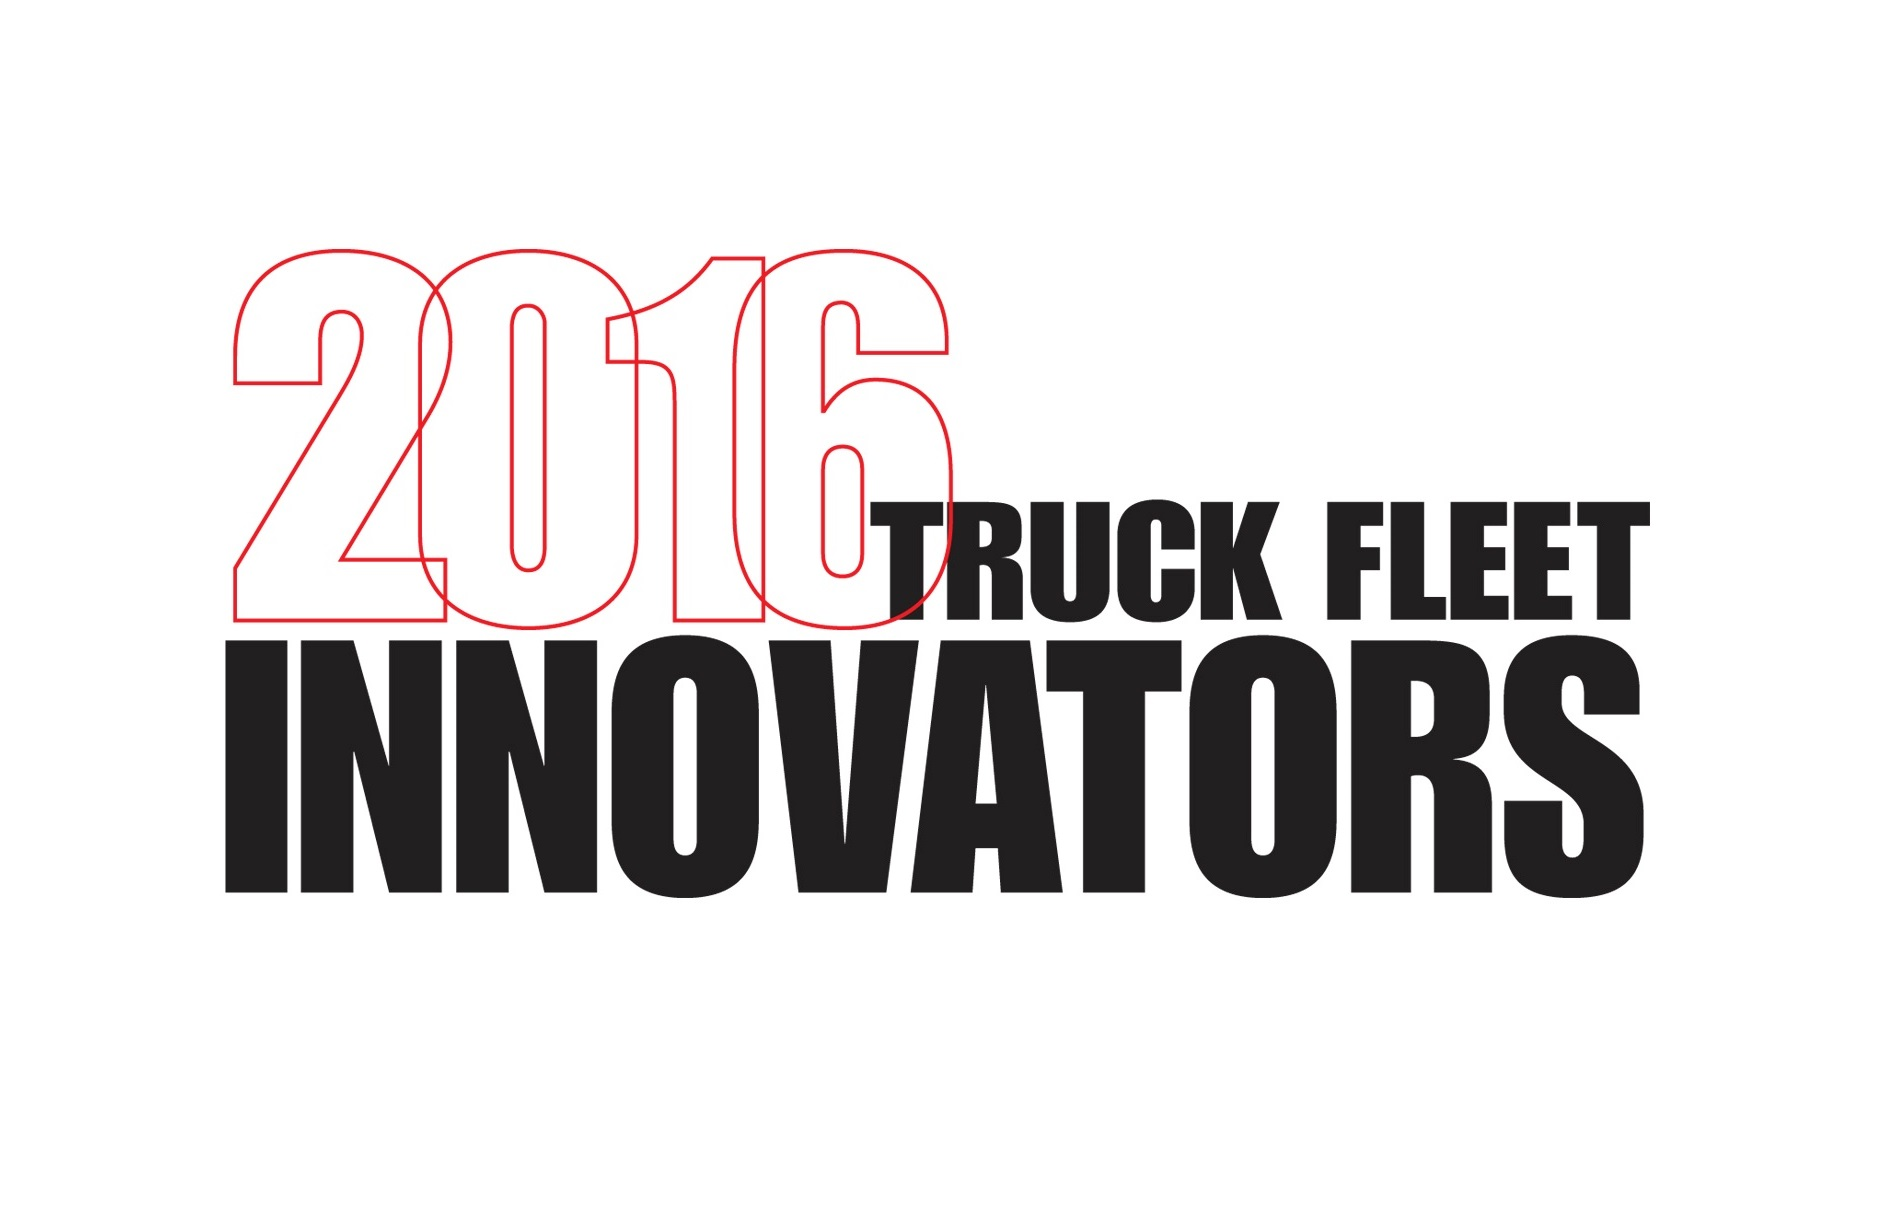 Fleet Innovators Nominations Deadline Extended to Dec. 11